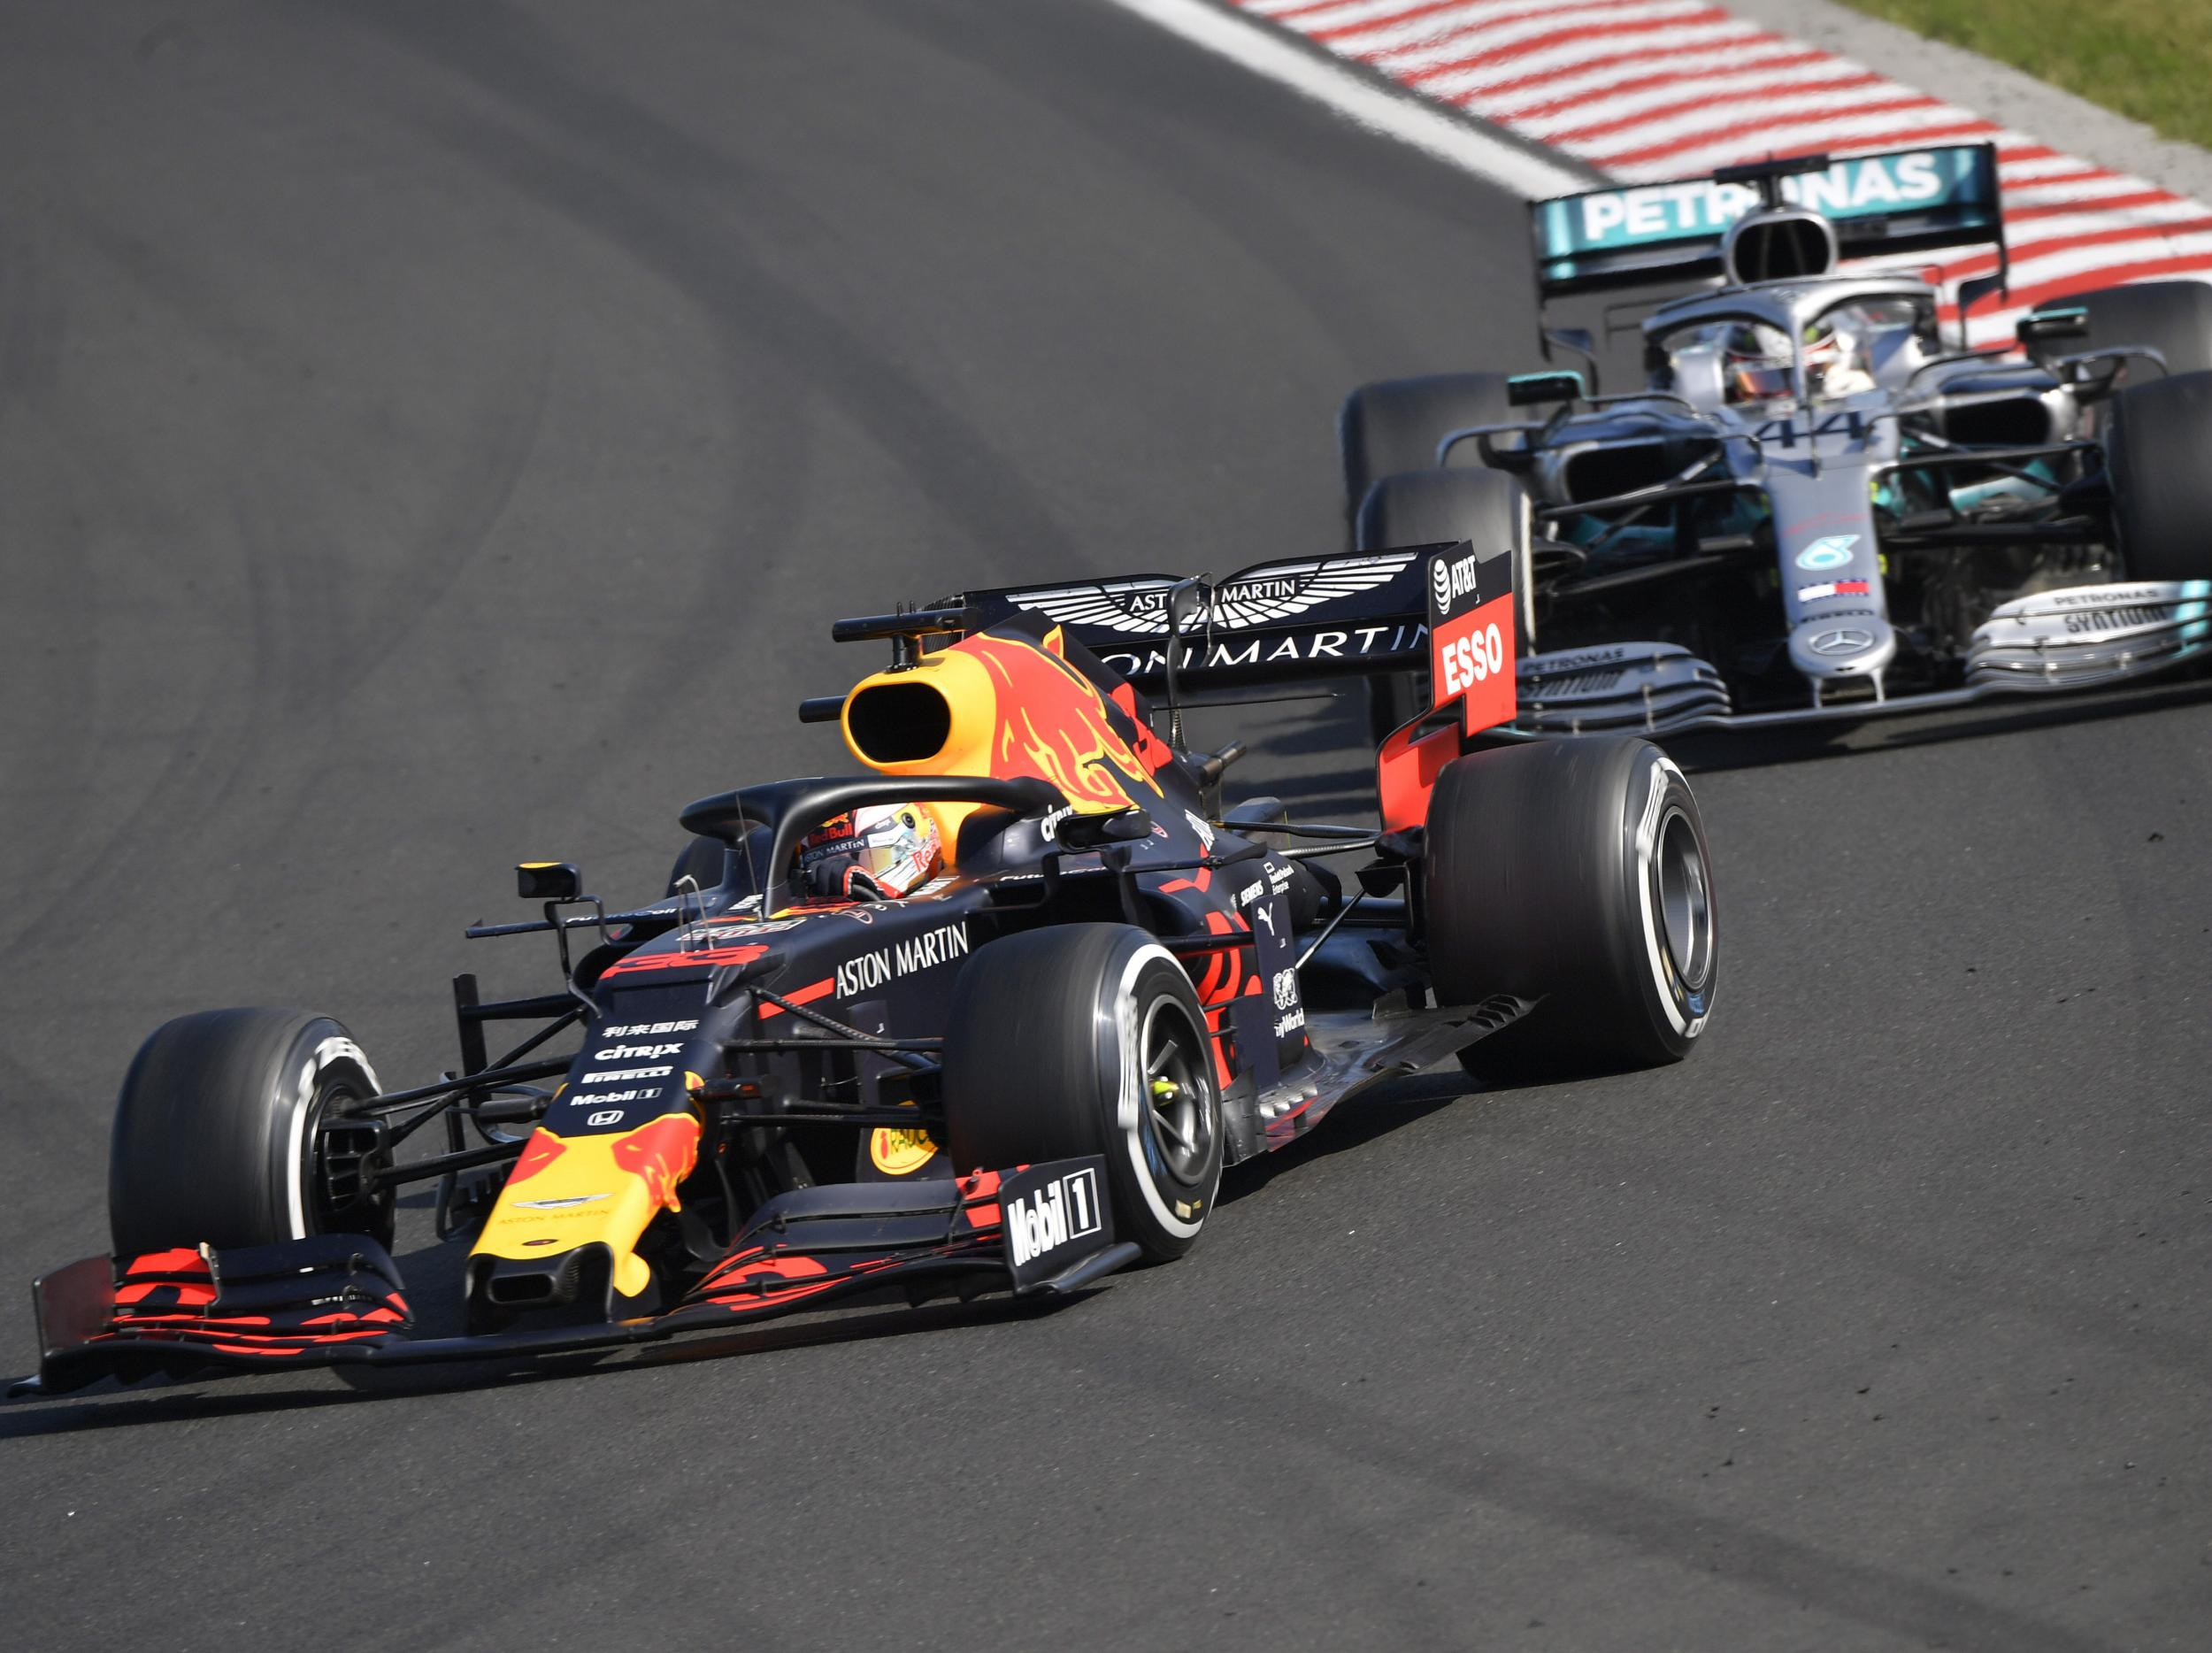 F1: Hamilton overtakes Verstappen on last lap to win Hungarian GP